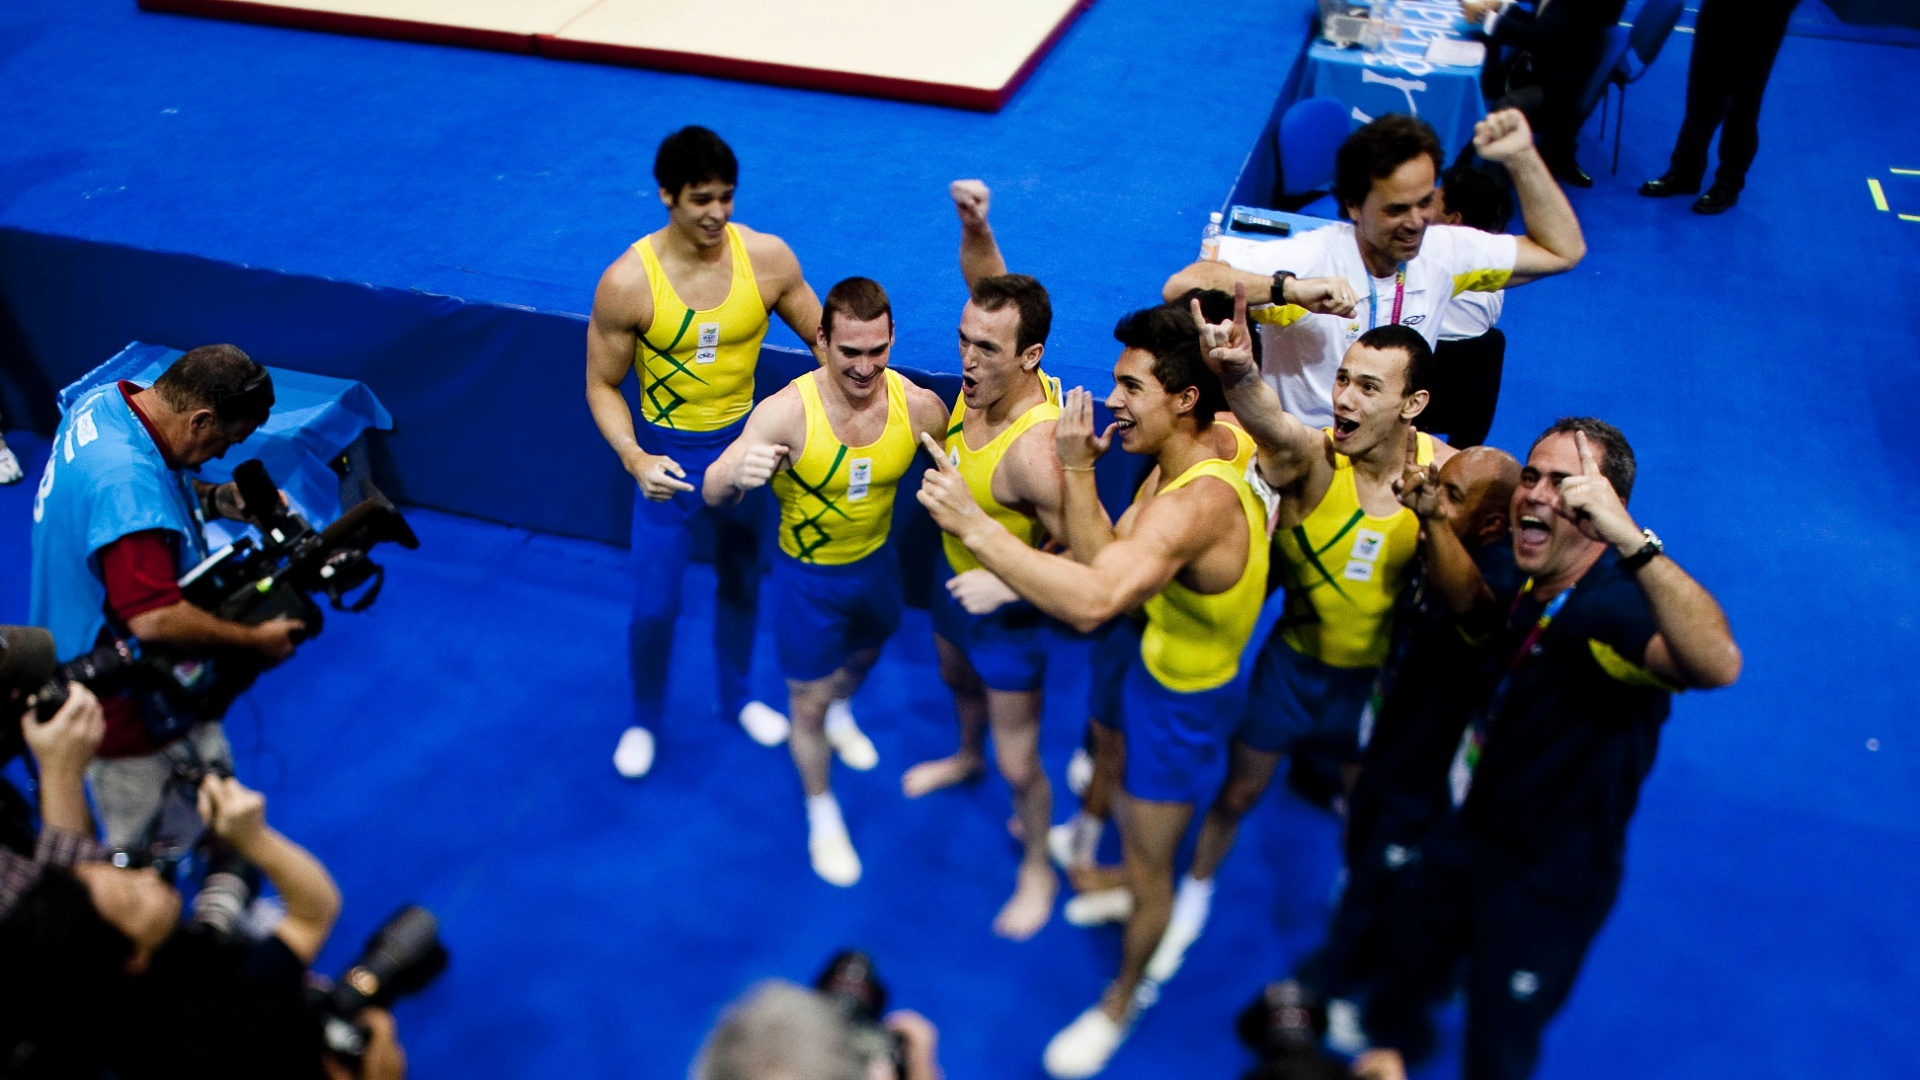 Equipe brasileira da ginástica artística comemora medalha de ouro no Pan-Americano (25/10/2011)